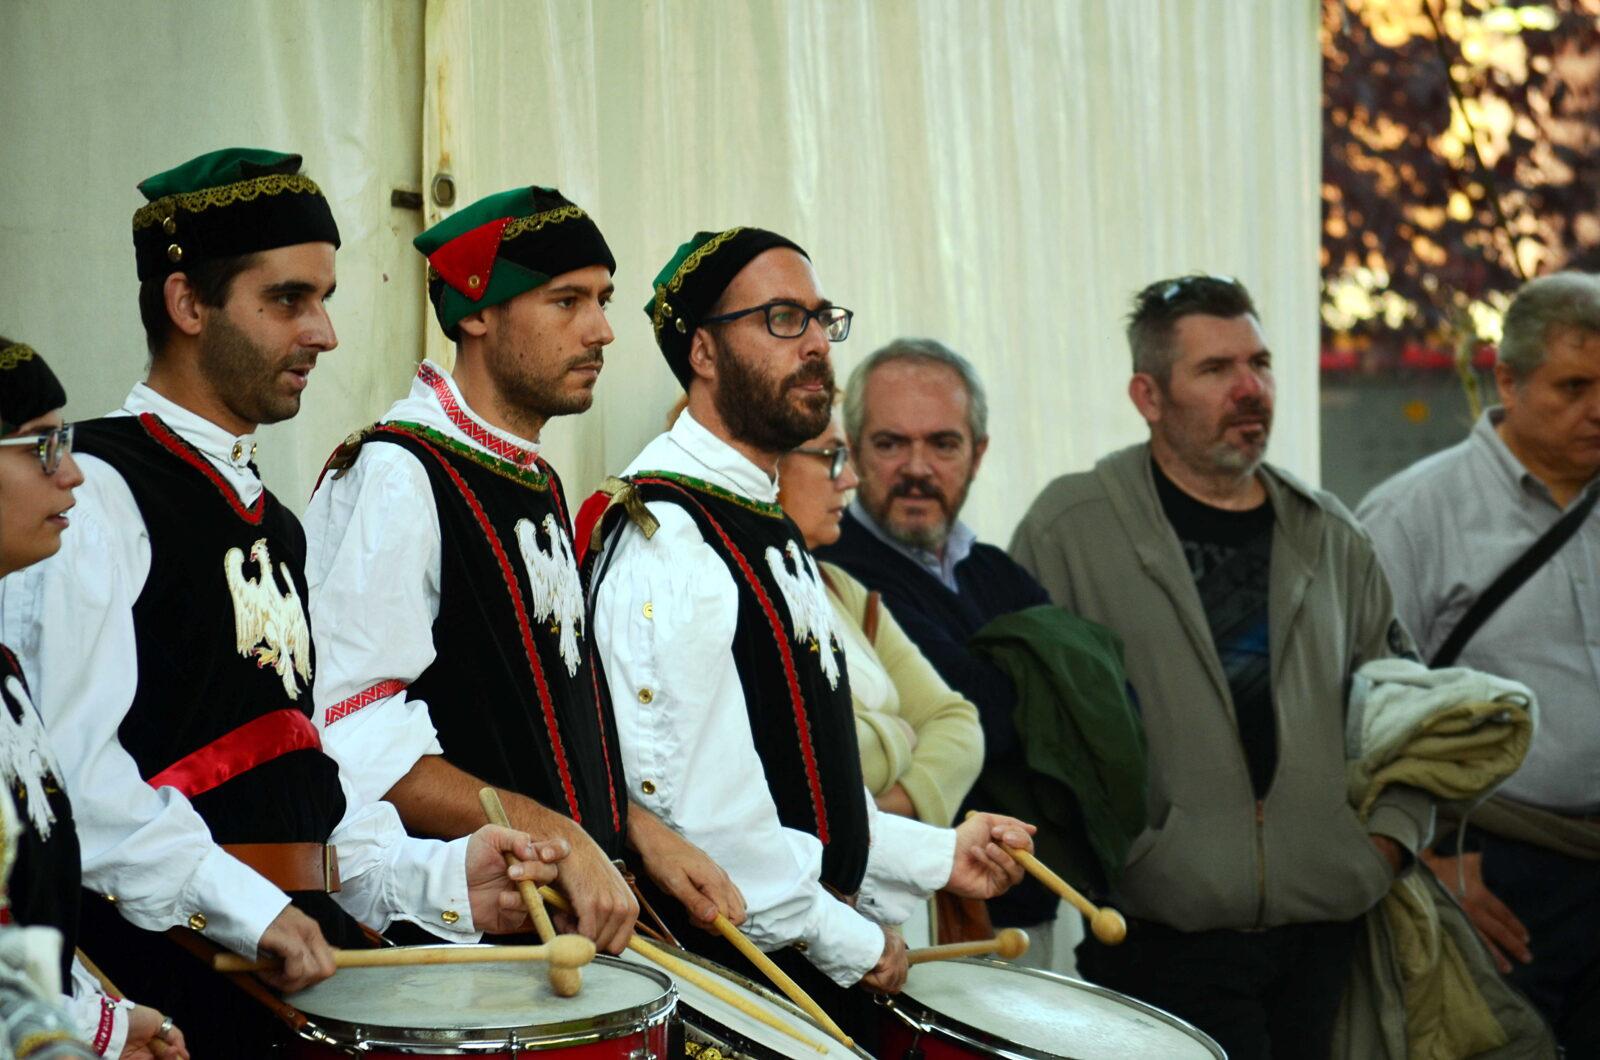 Gruppo Musici